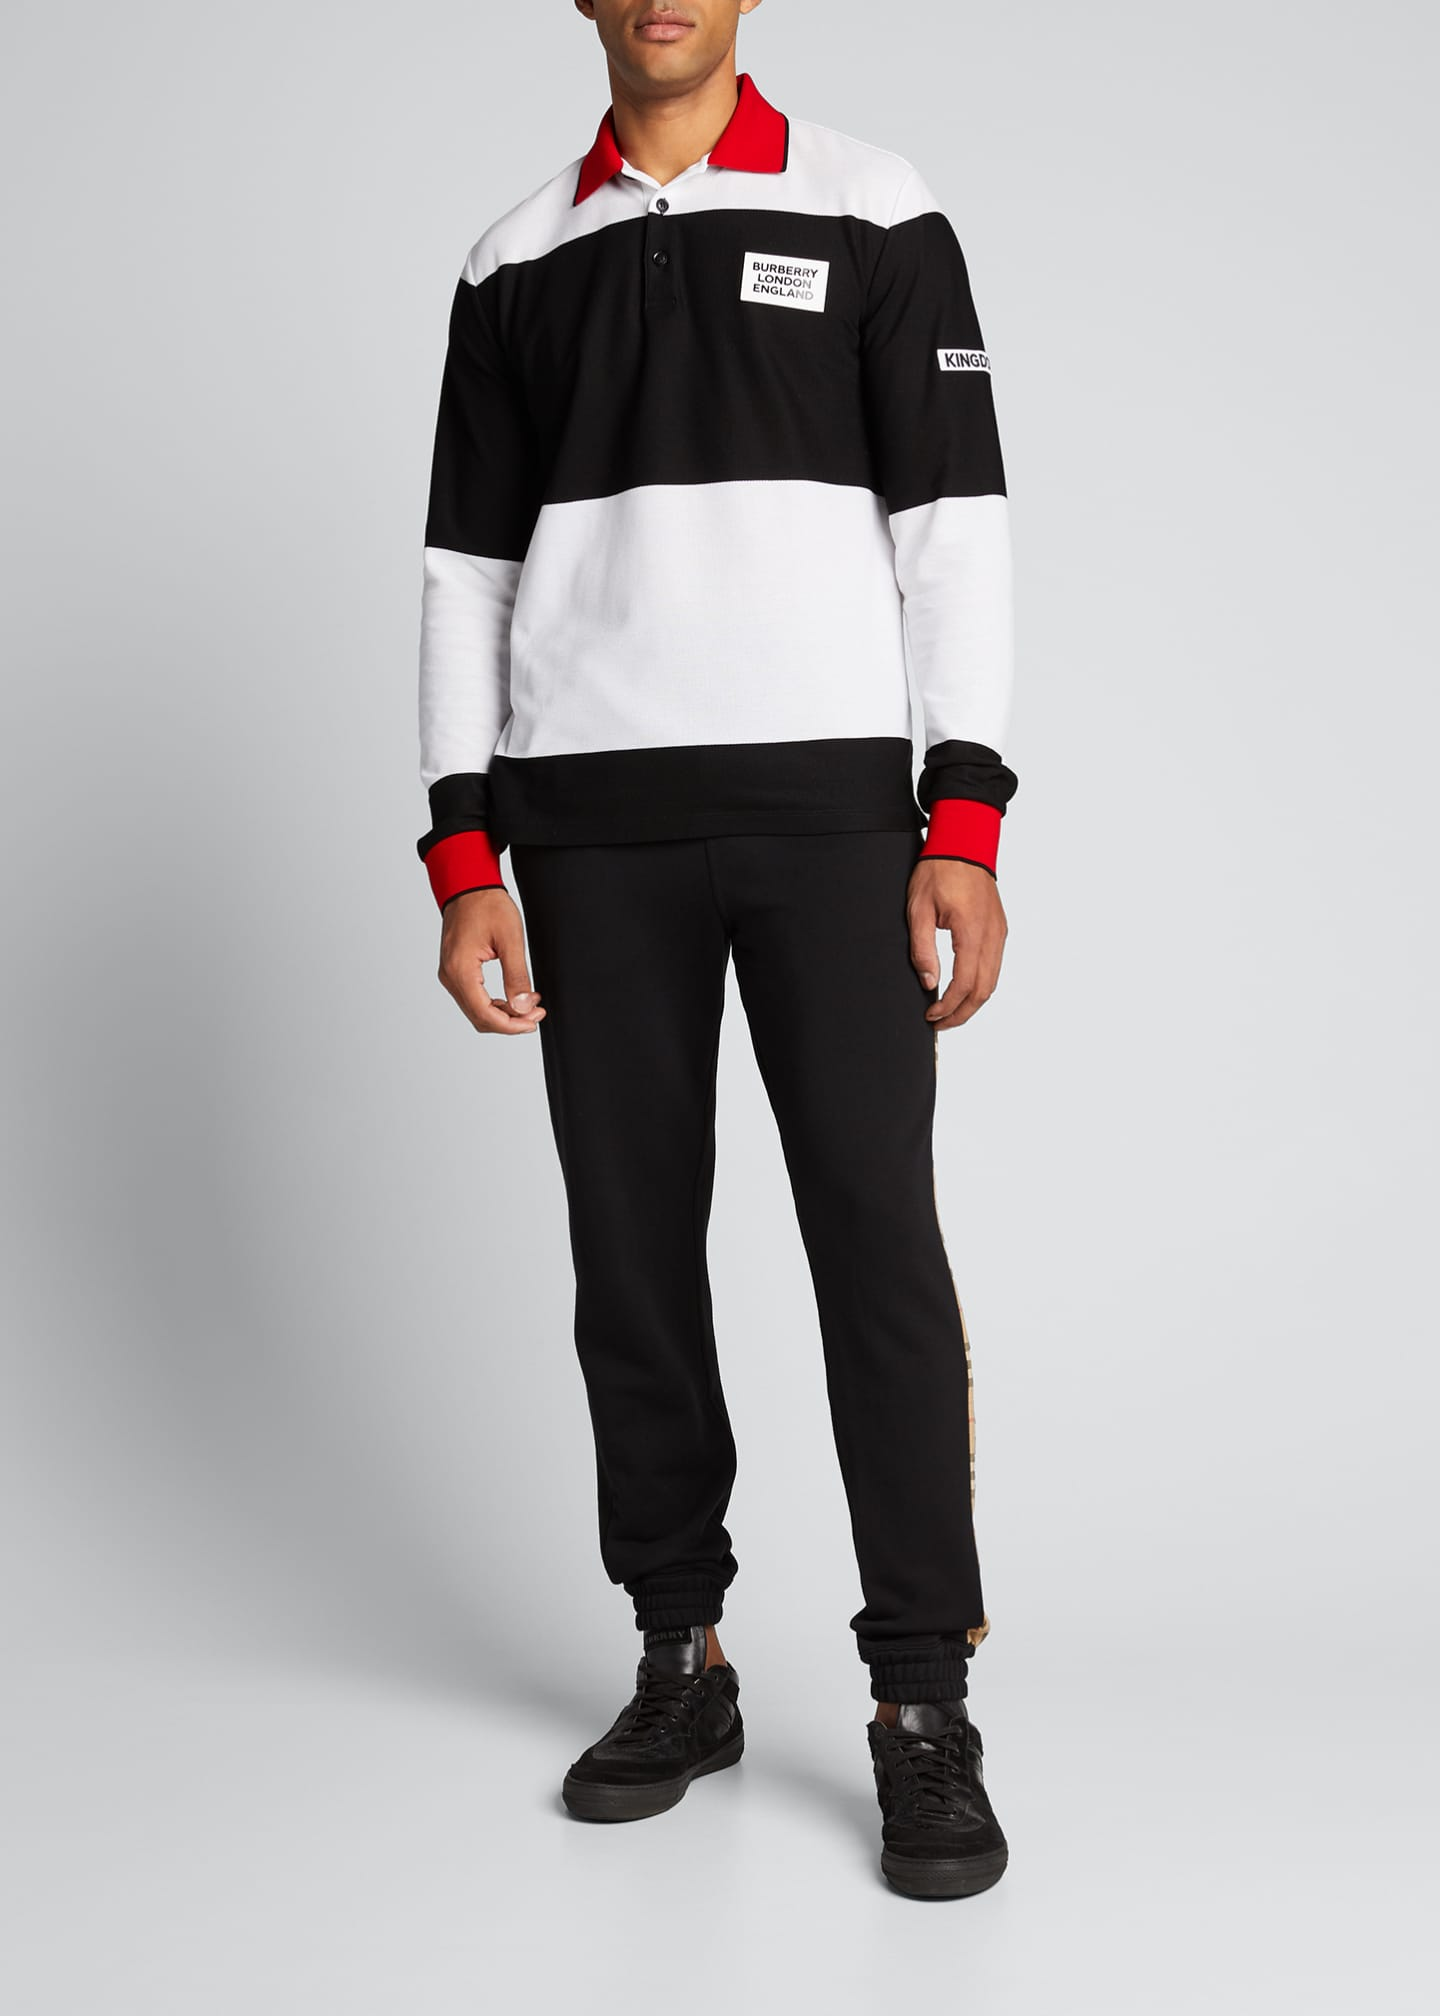 Burberry Men's Copland Long-Sleeve Polo Shirt